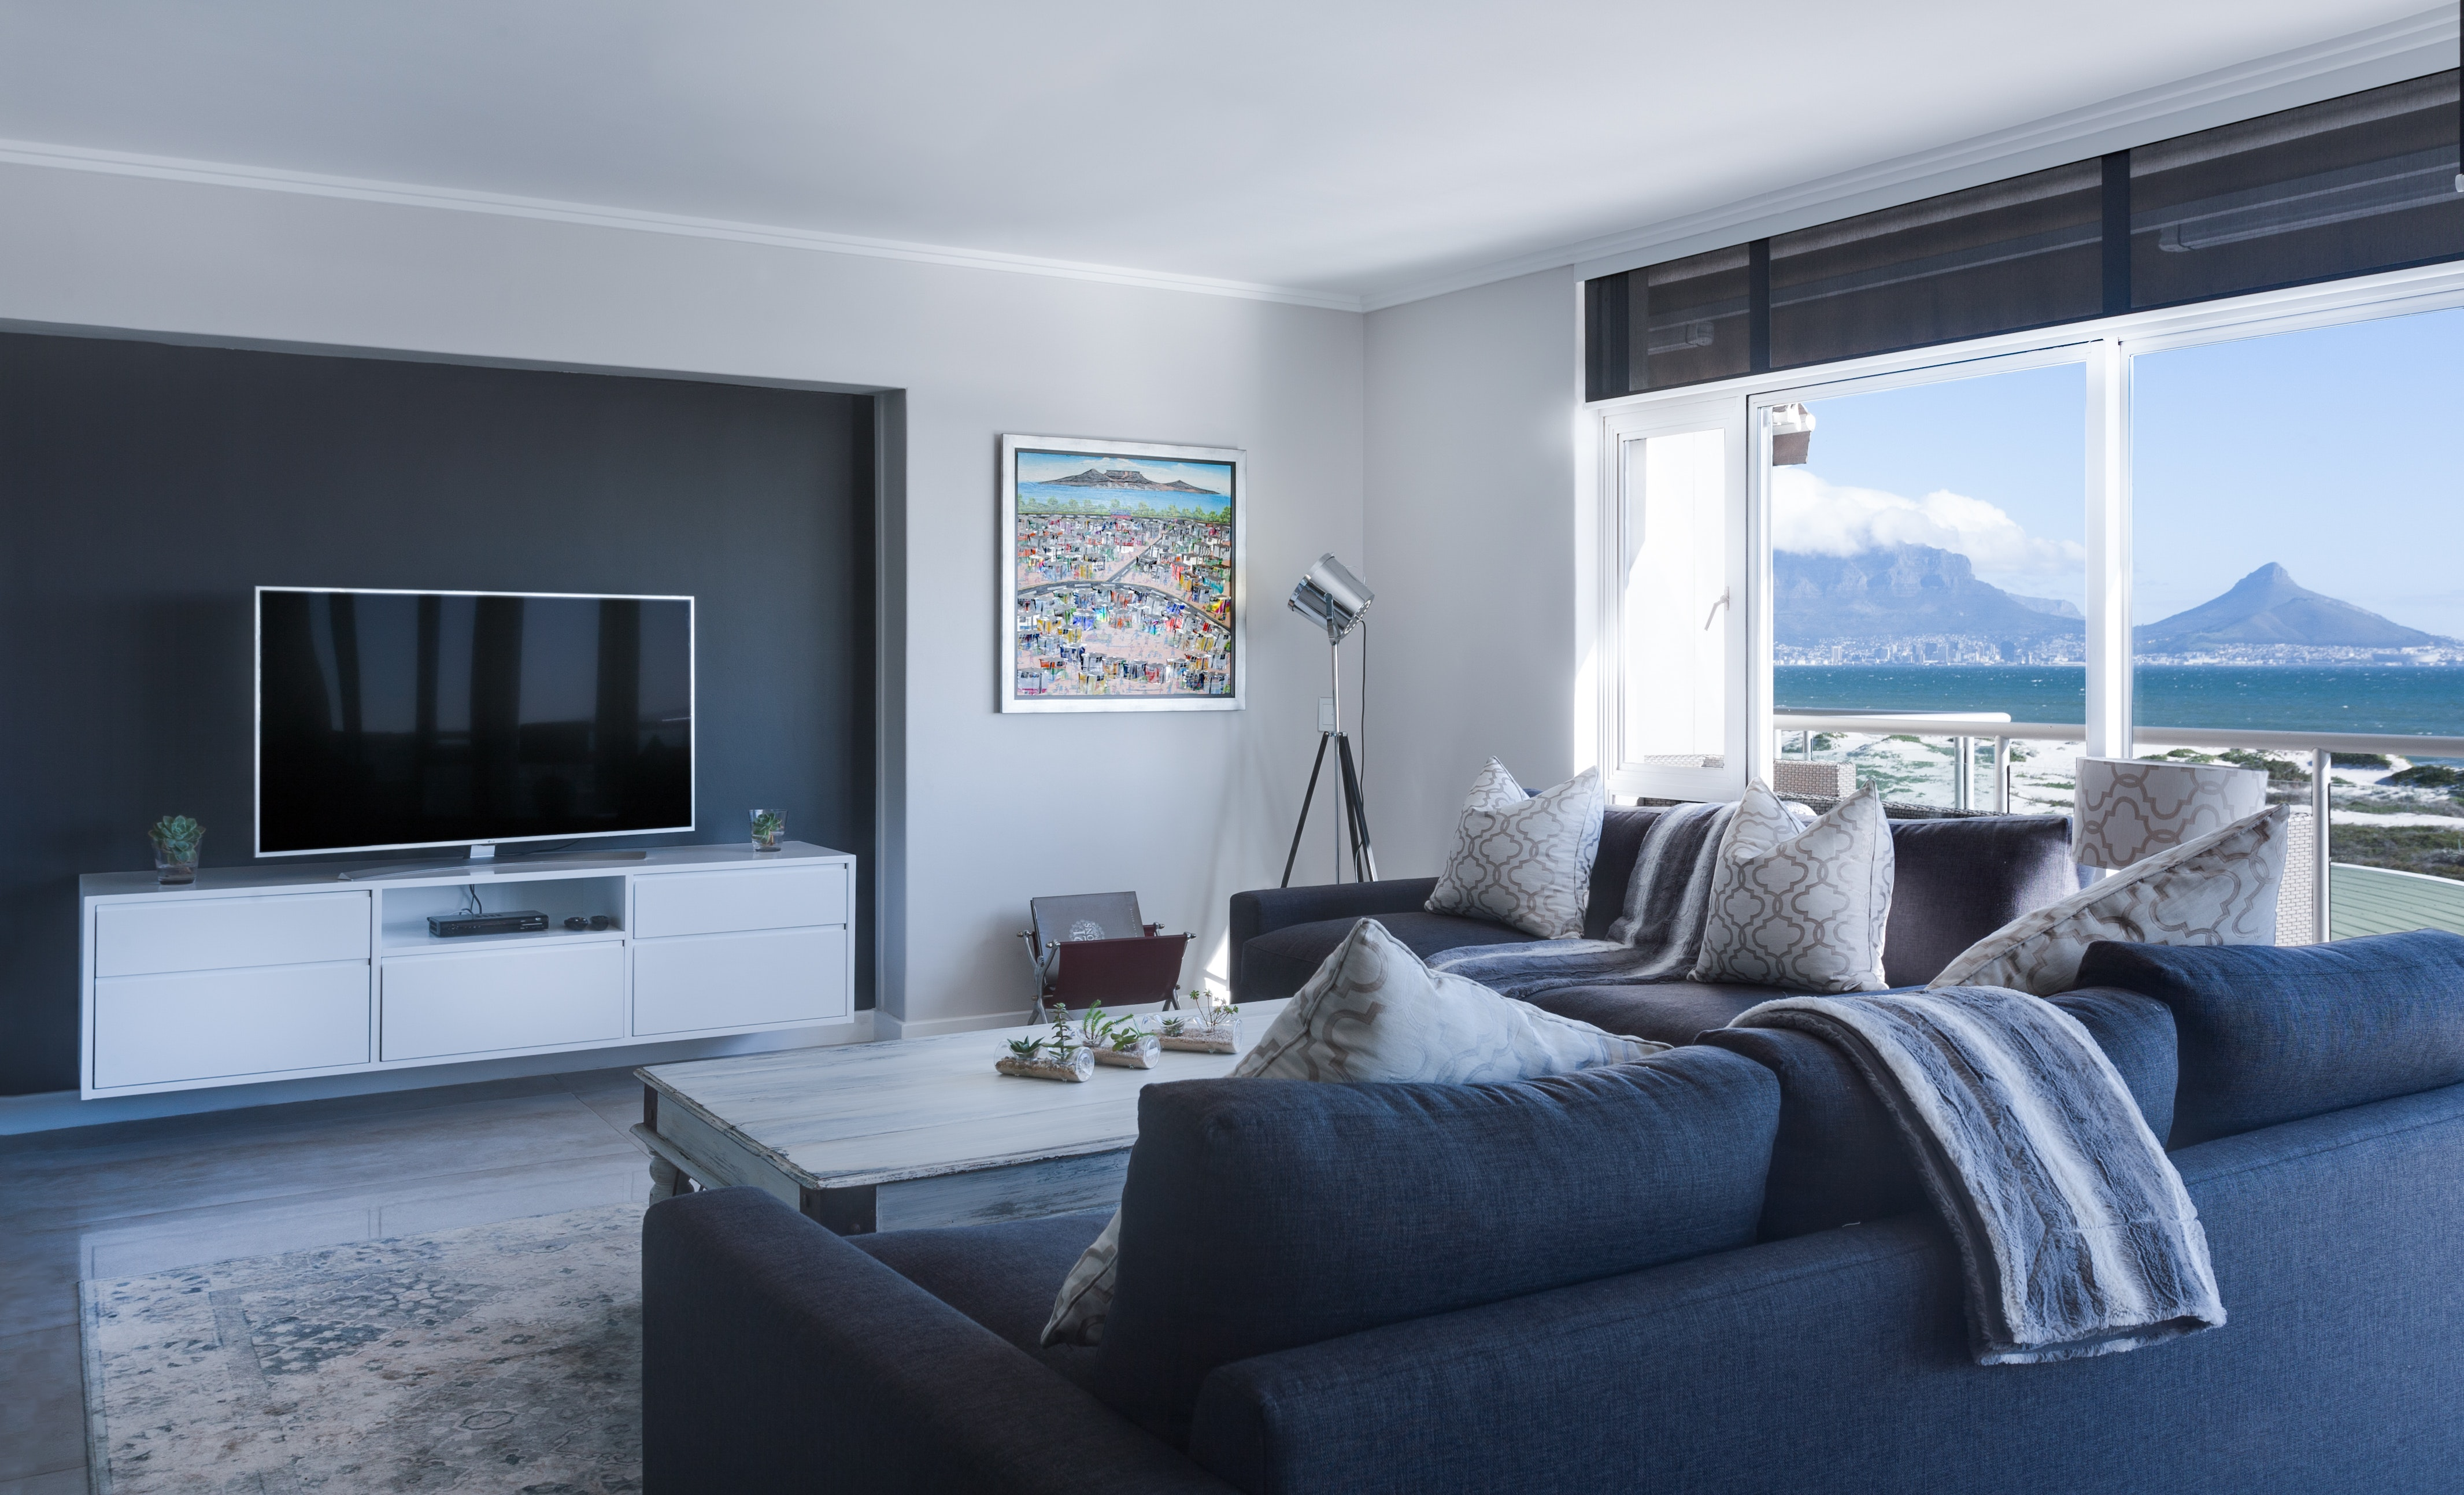 Floor Length Window Treatment Ideas: Living Rooms